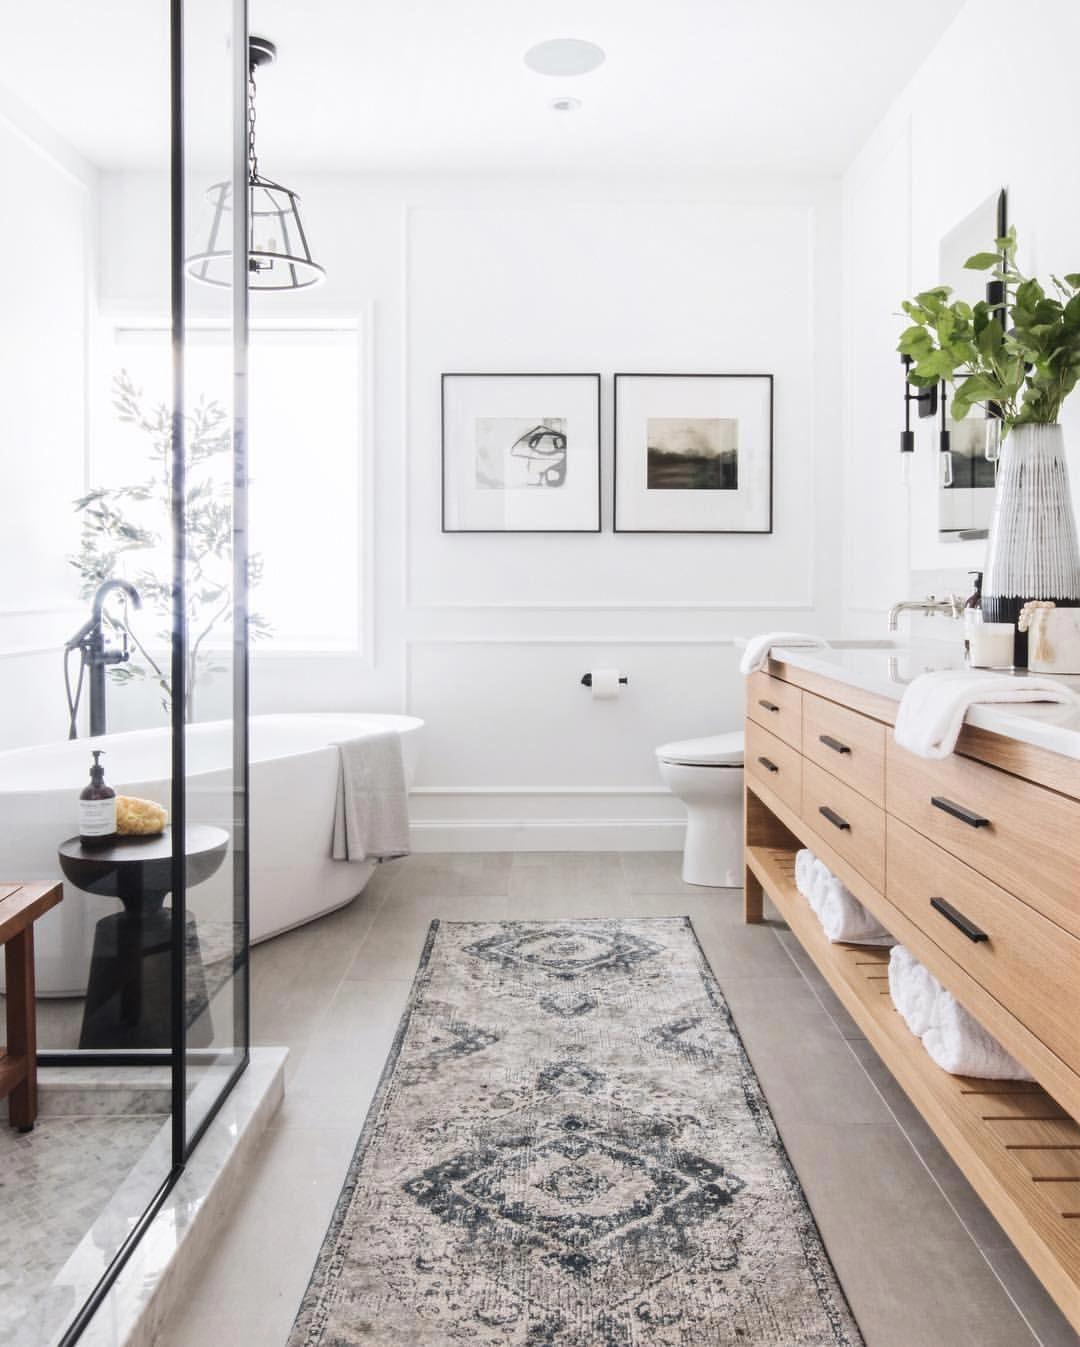 Bathroom collection sets yellow bathroom set decorative bathroom accessories sets 20190108